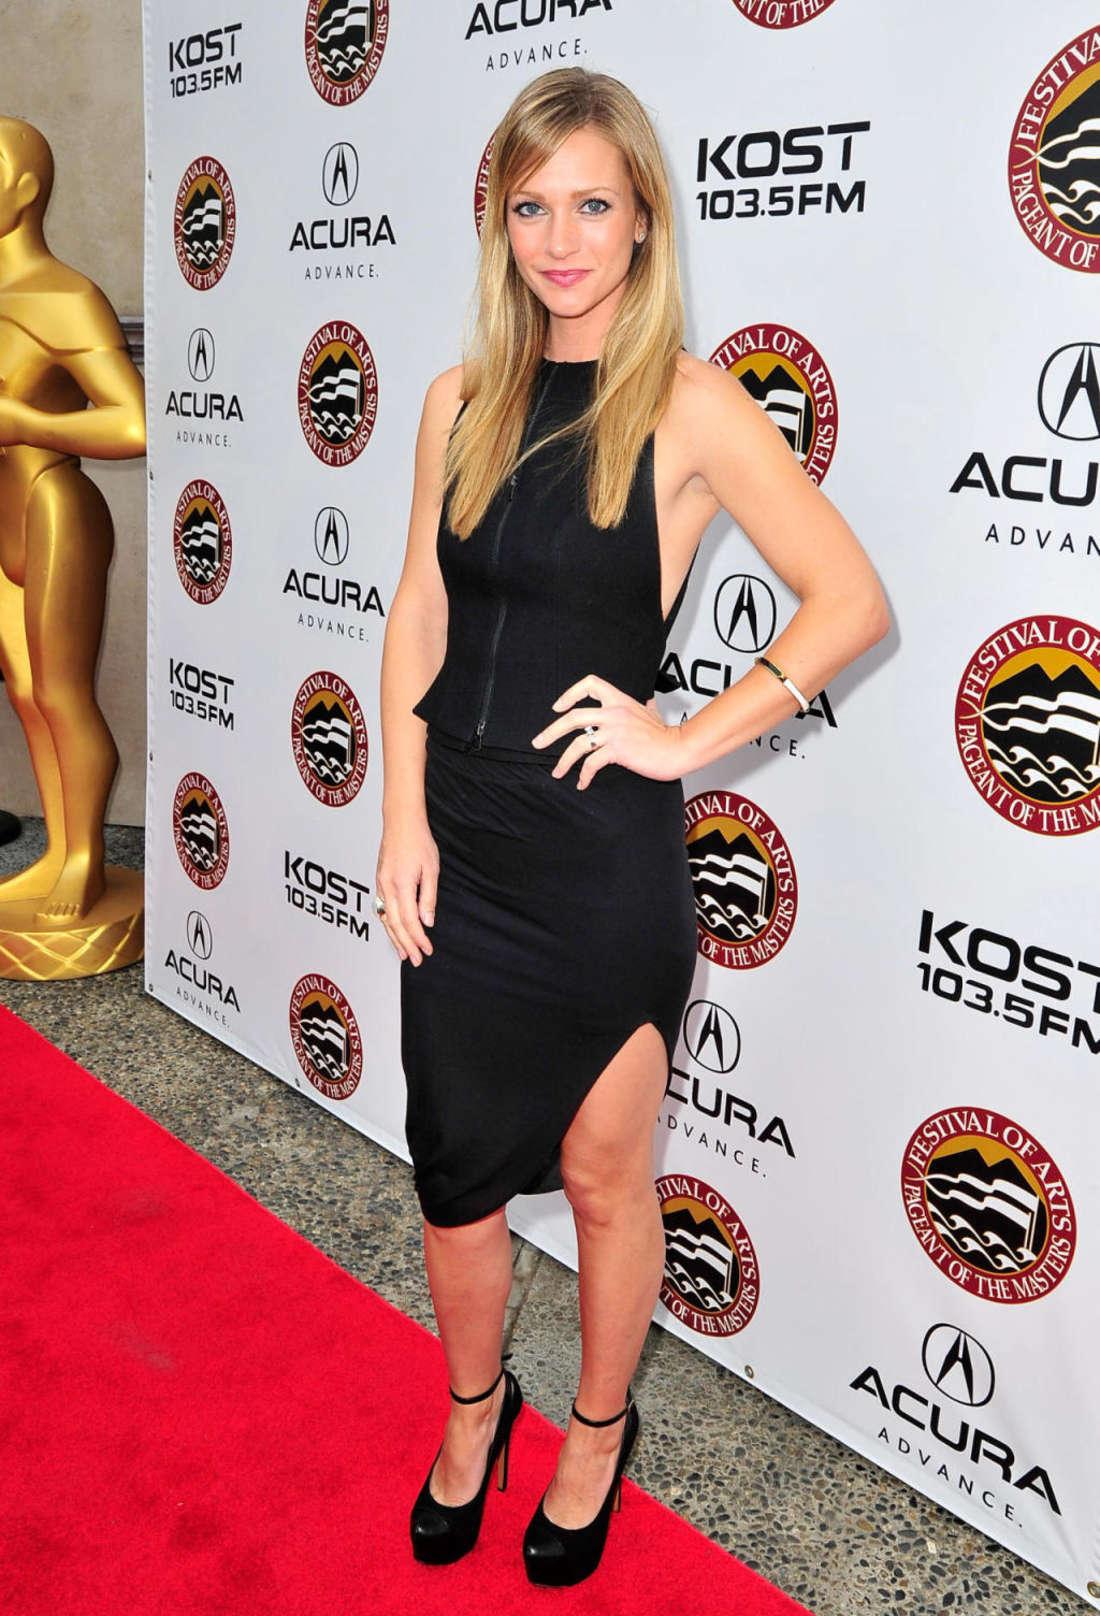 Acura Santa Monica >> AJ Cook Photos: 2013 Acura KOST Celebrity Benefit Concert ...